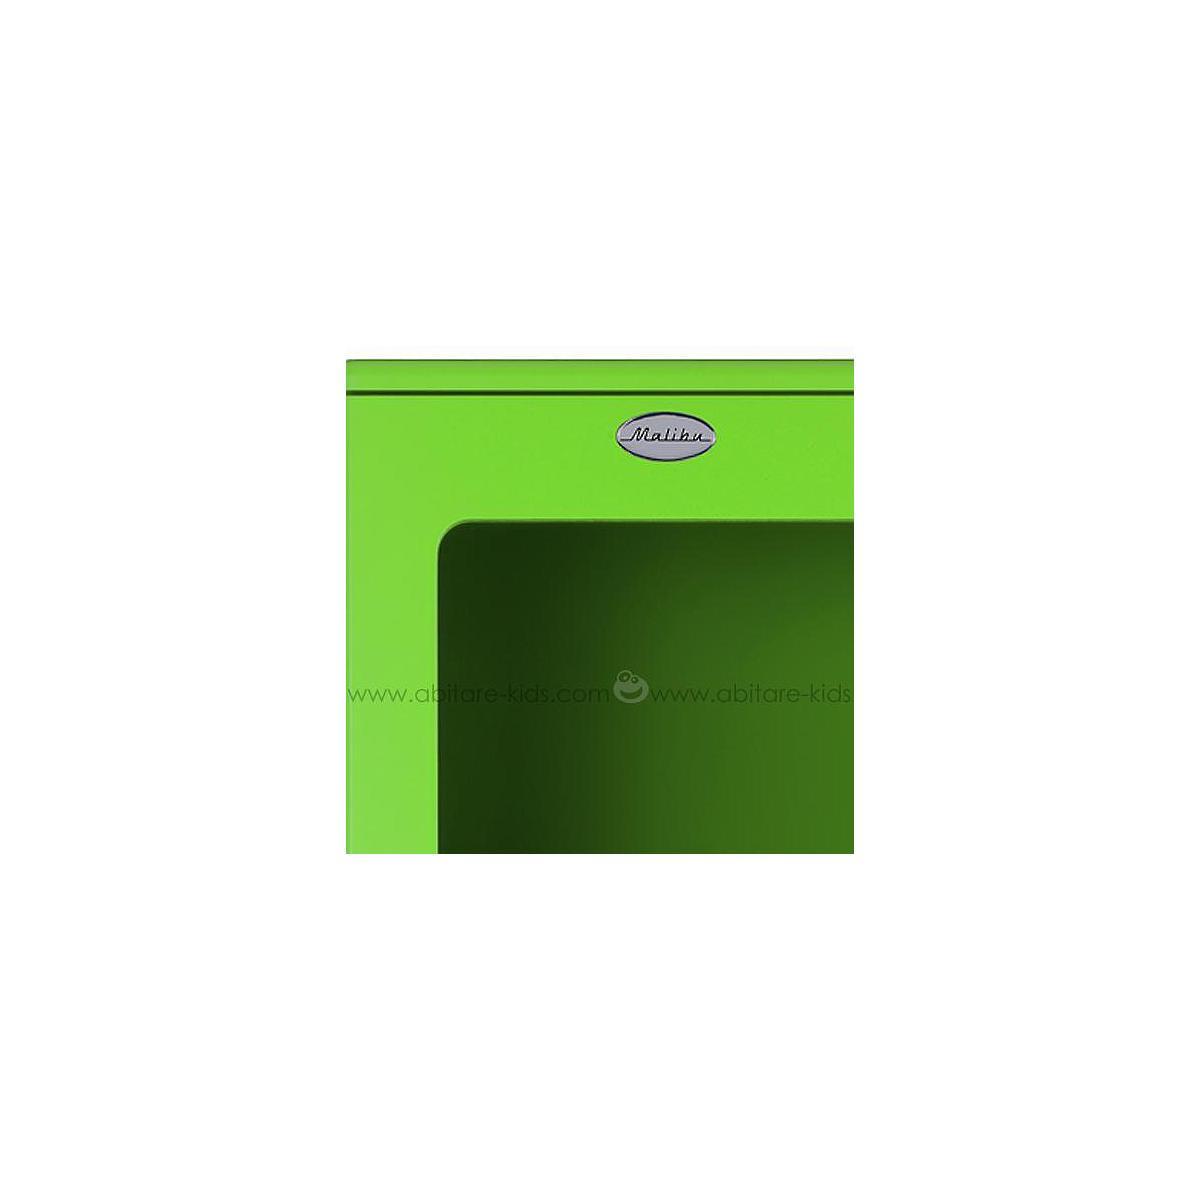 MALIBU by Tenzo Armoire vitrée standard- Vert